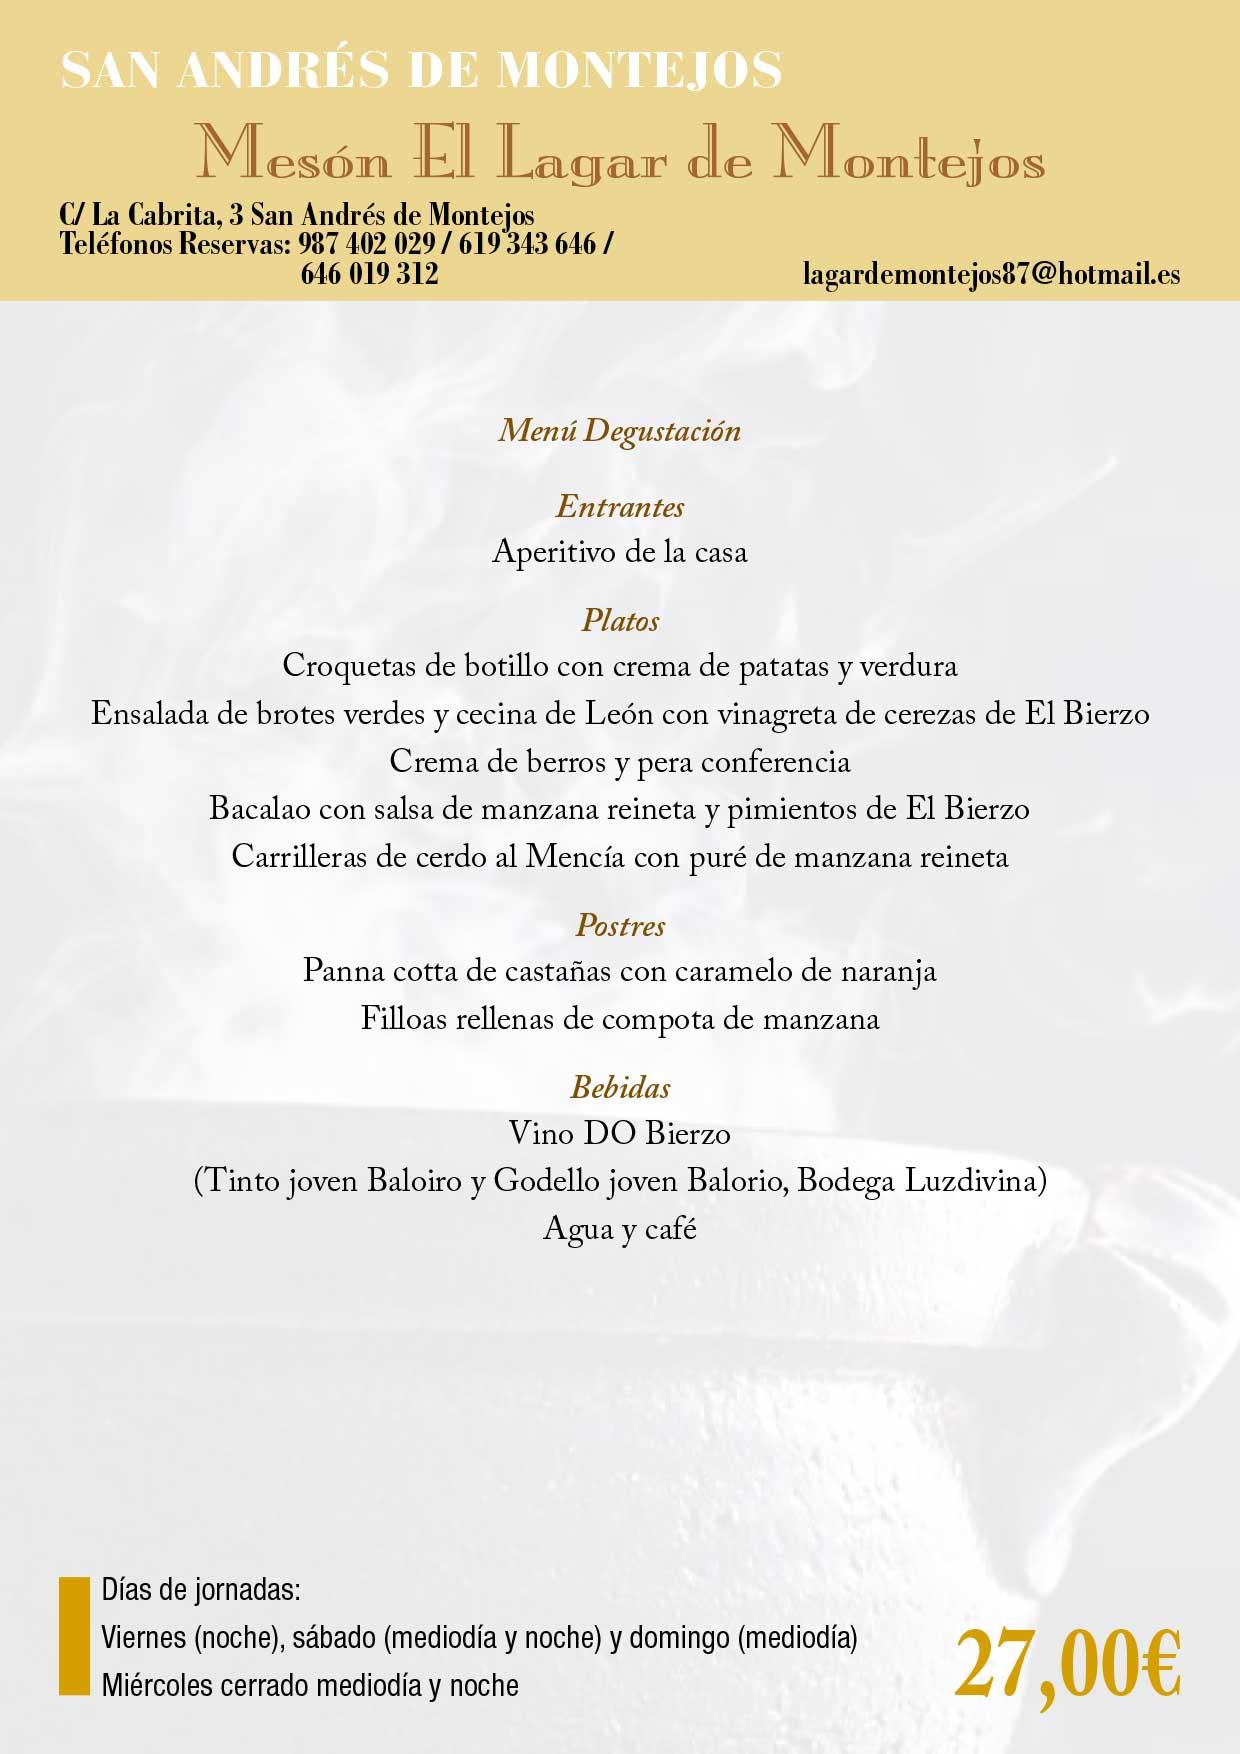 XXXIII Jornadas gastronómicas del Bierzo 2017. Restaurantes participantes 17